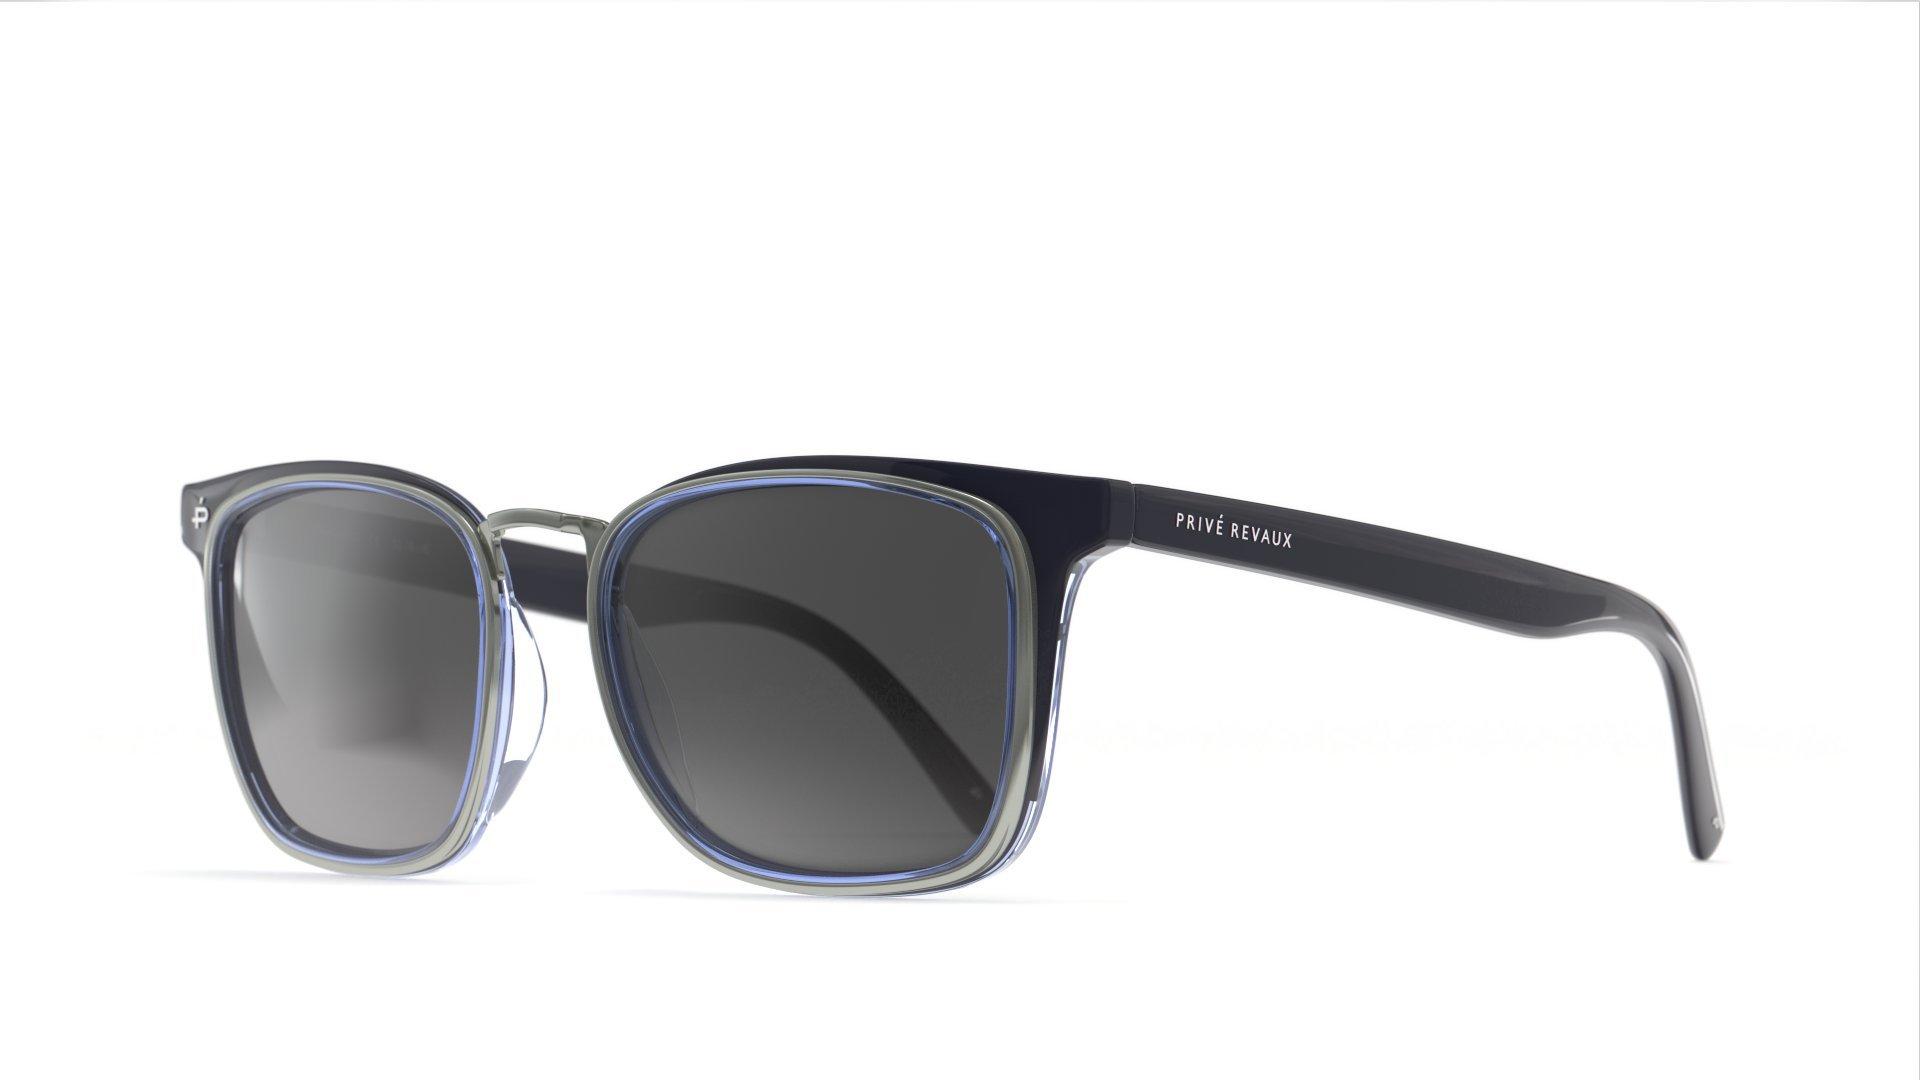 PRIVÉ REVAUX Places We Love Collection''The O.H.I.O'' Polarized Designer Square Sunglasses RandM Colab by PRIVÉ REVAUX (Image #2)